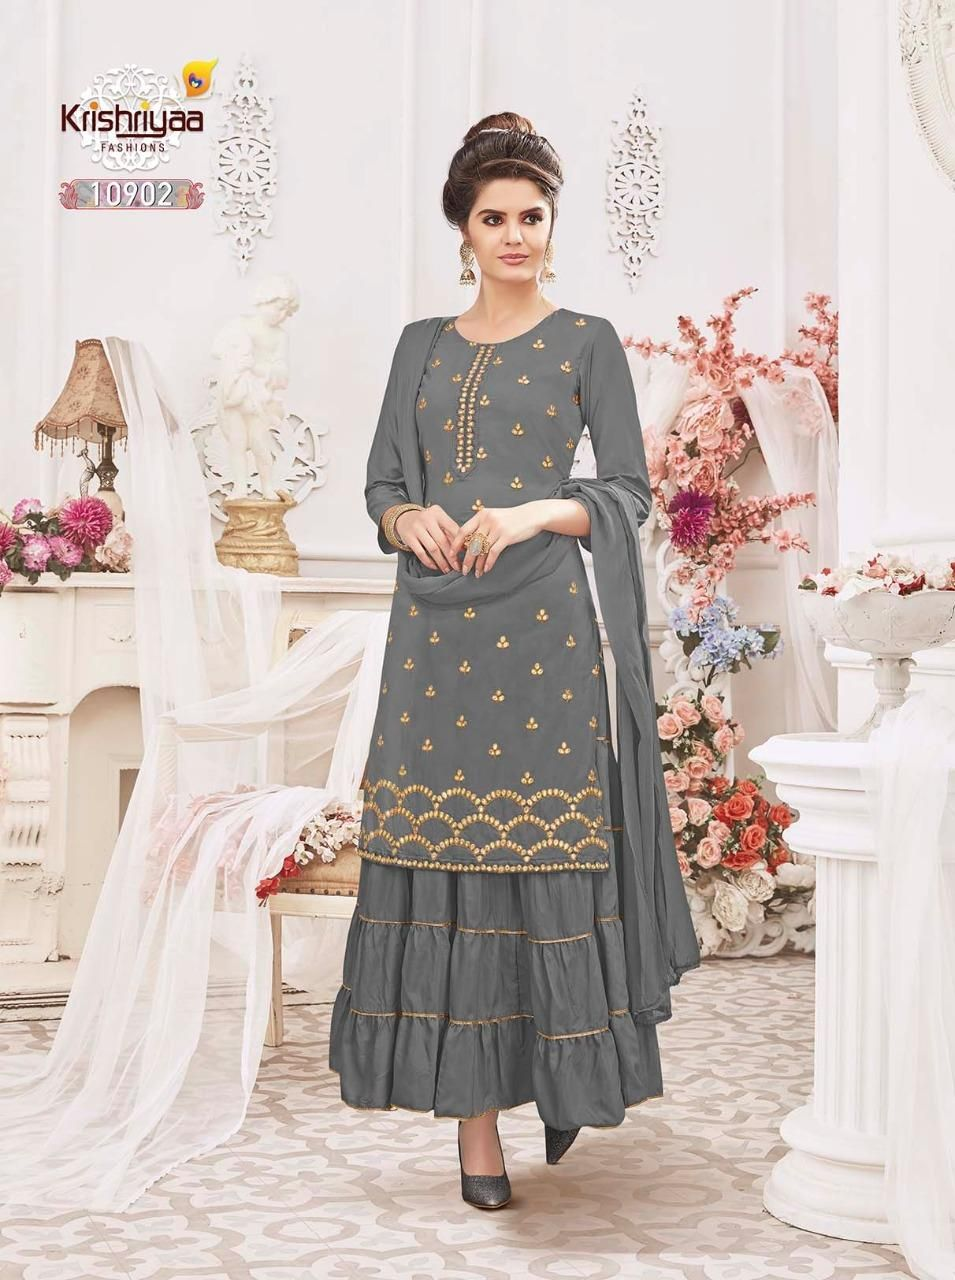 a35d4b64e Buy Designer Krishriyaa Magnifique Vol-3 Gown with Dupatta Kurti ...